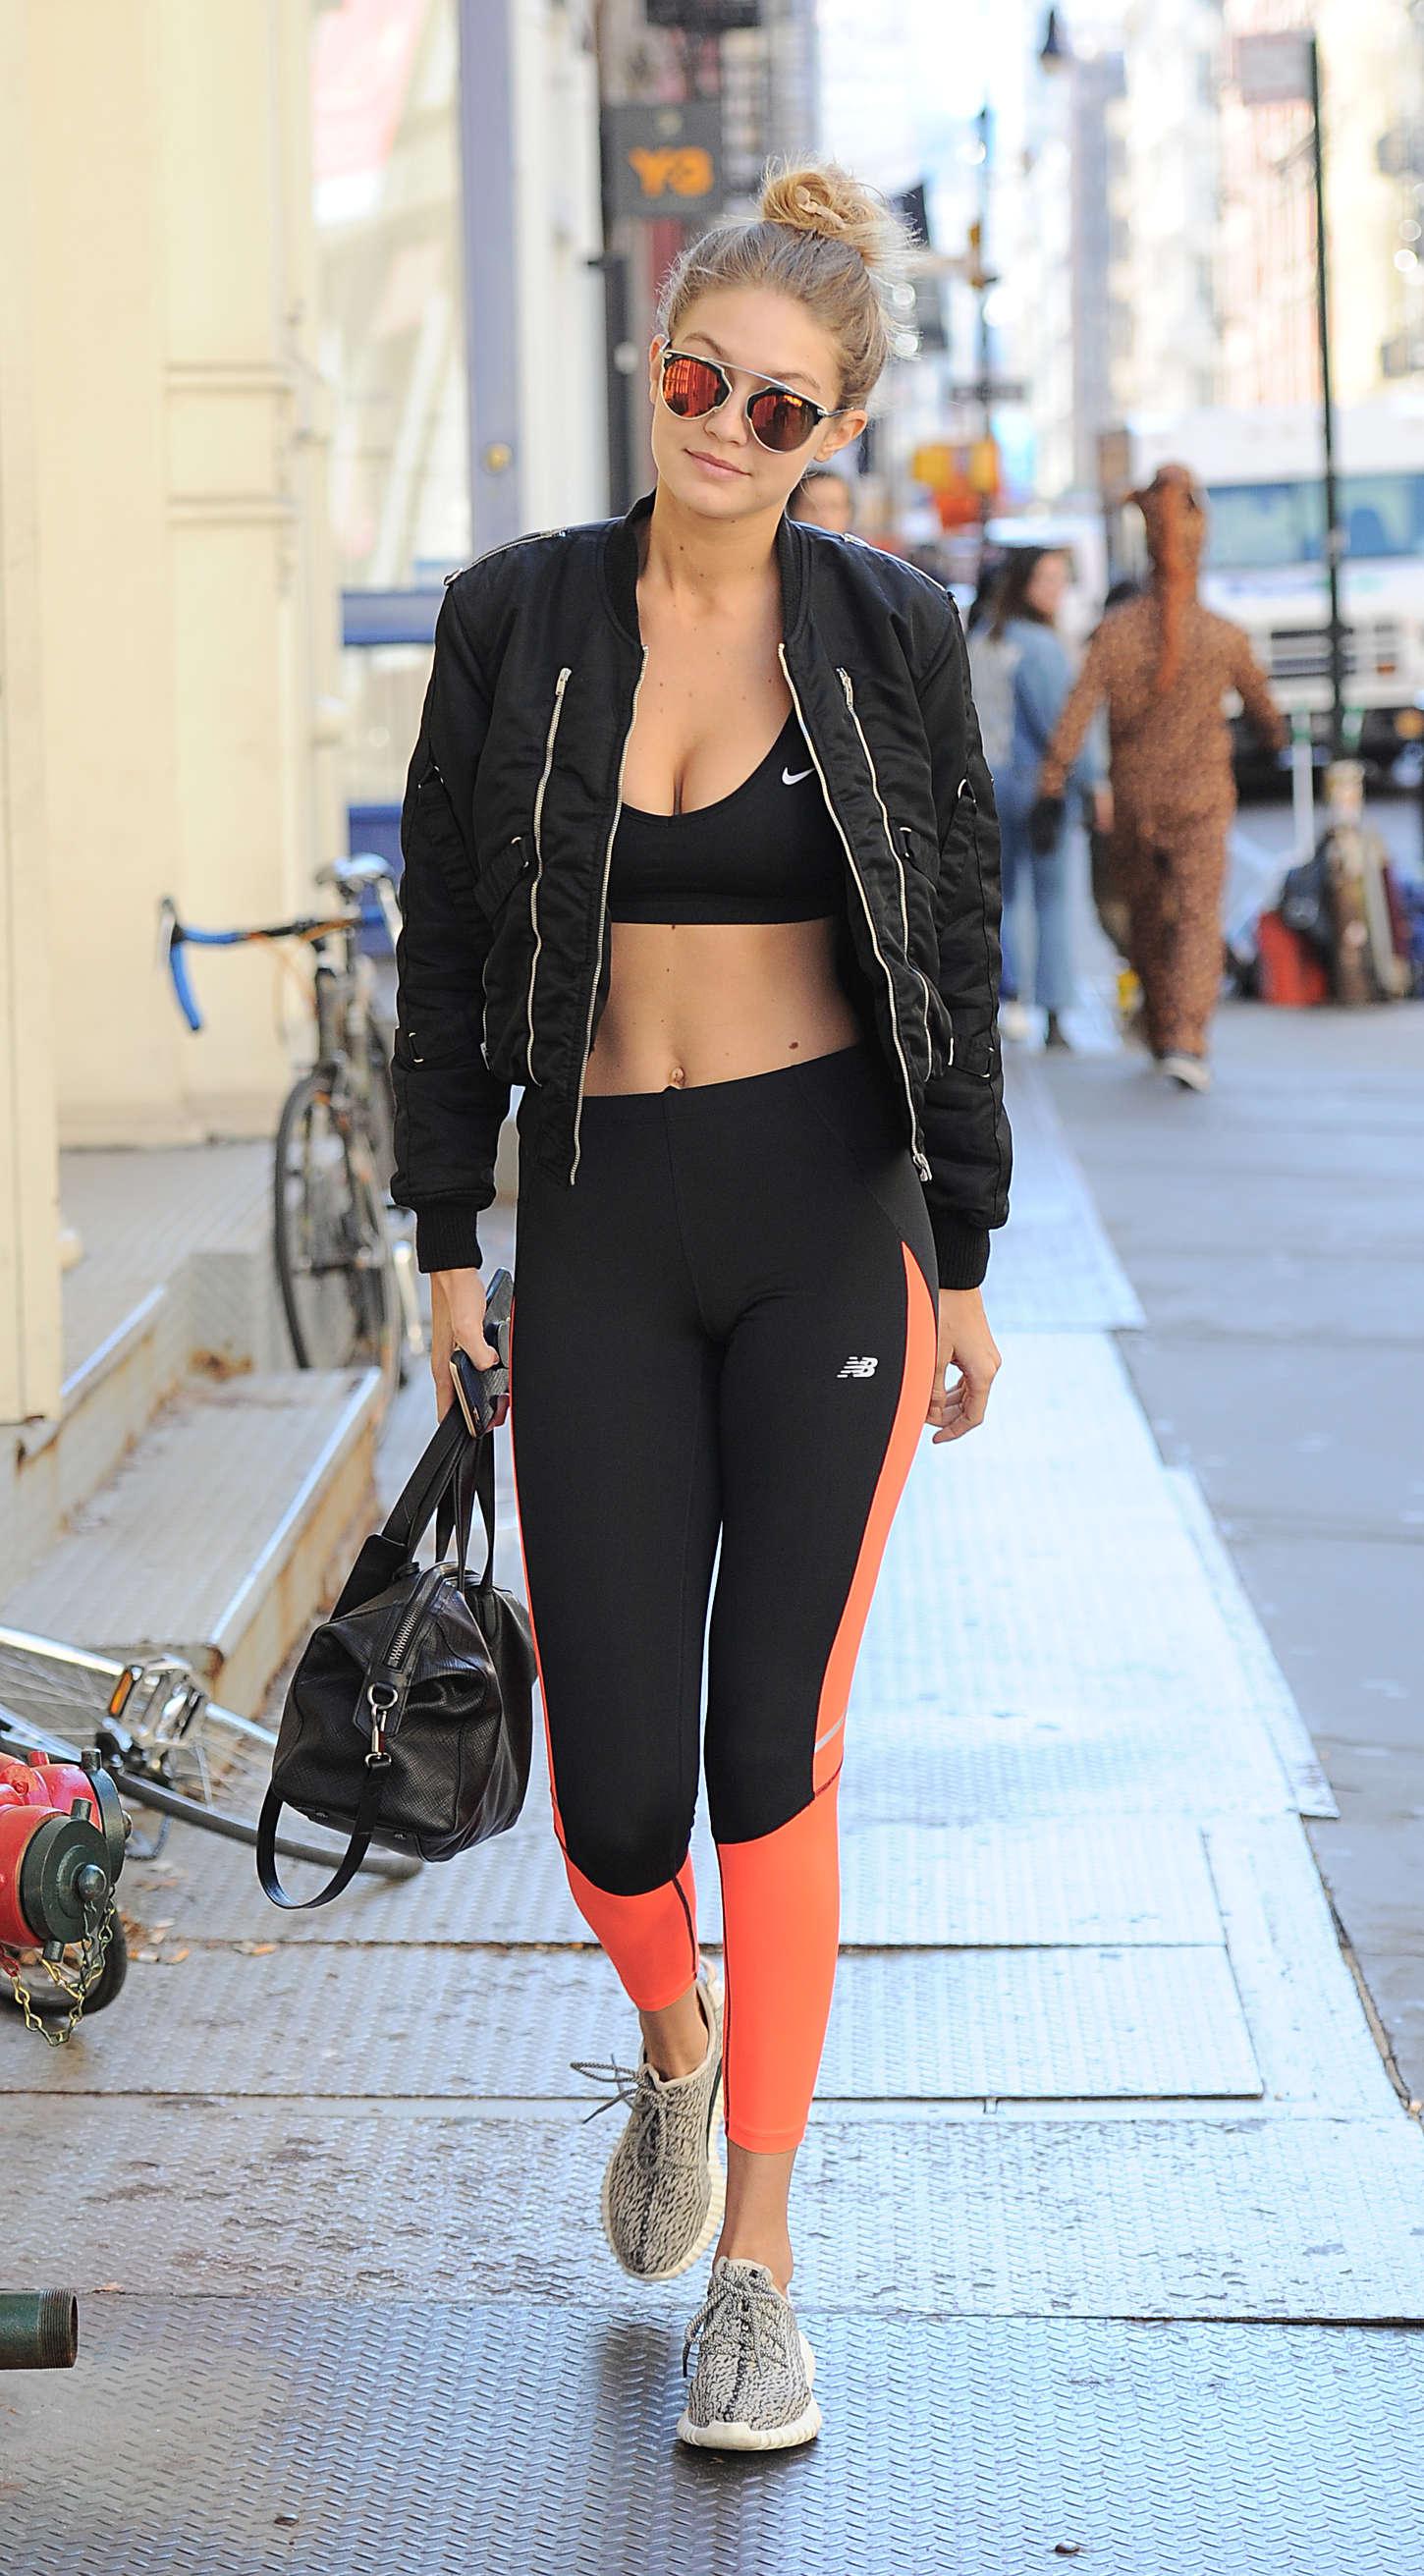 Gigi Hadid 2015 : Gigi Hadid in Sports Bra and Tights -14